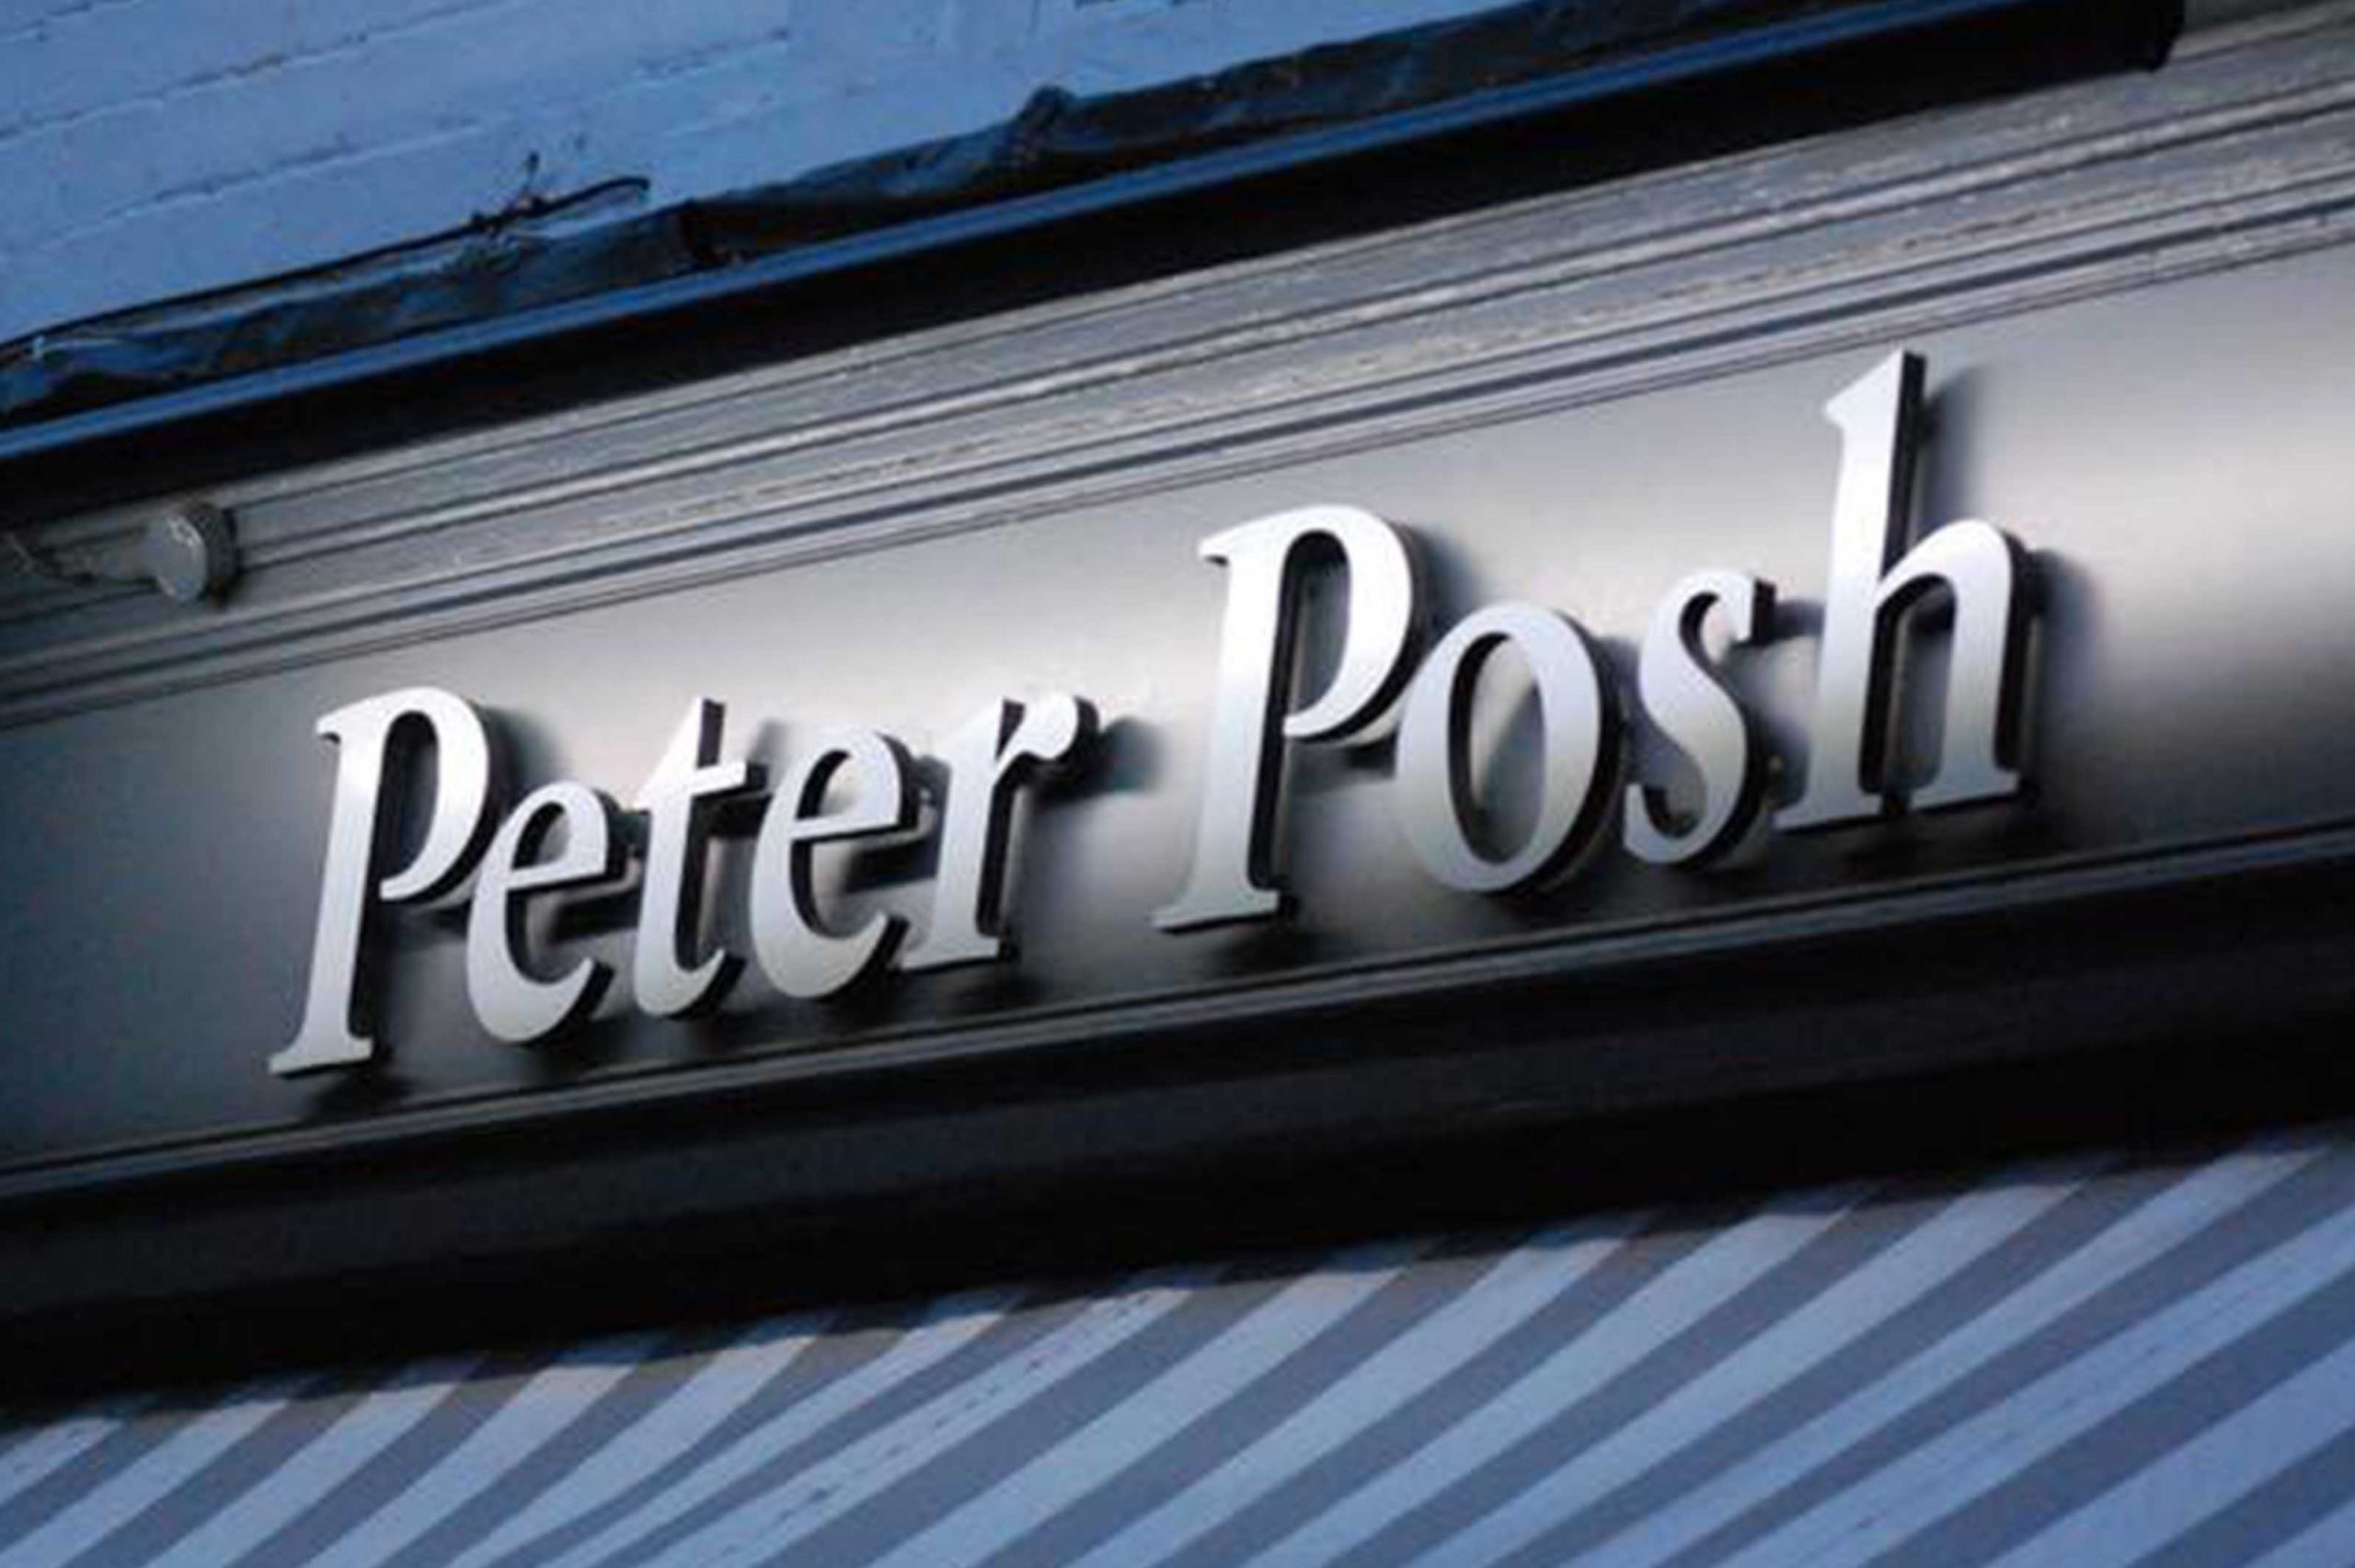 Peter Posh Signage